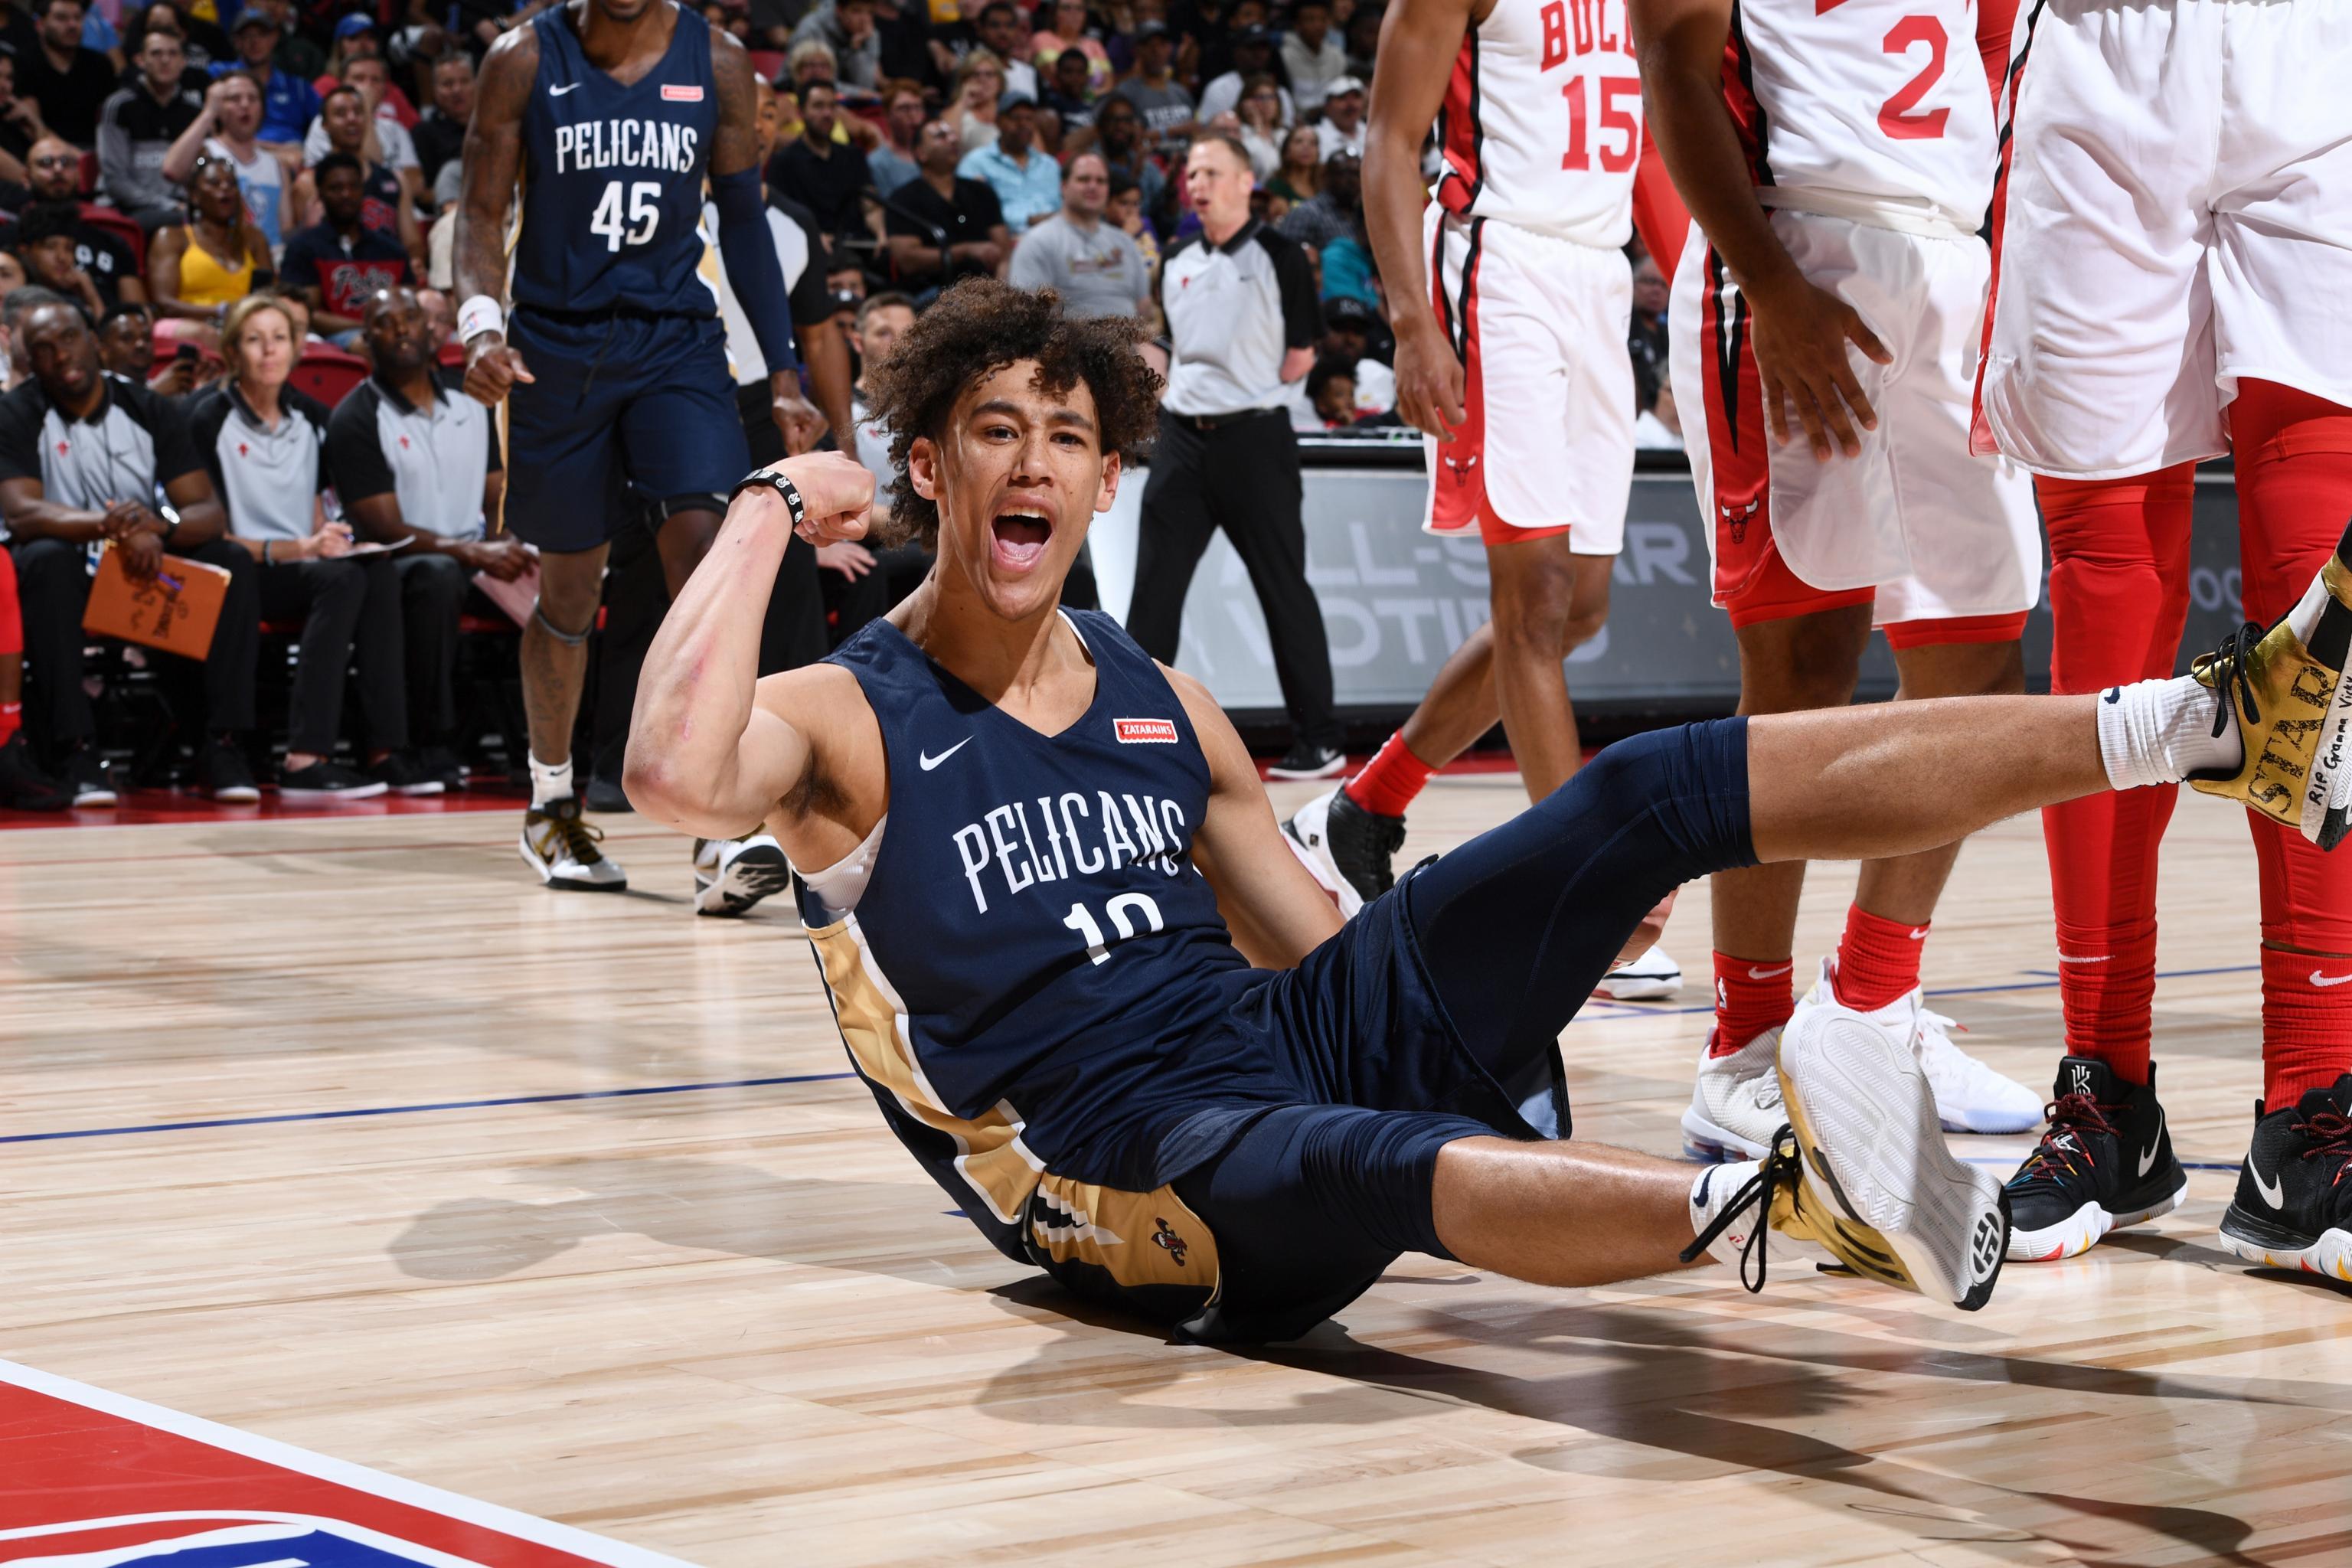 Meet The Other Pelicans Rookie Who Stole The Nba Summer League Spotlight Bleacher Report Latest News Videos And Highlights